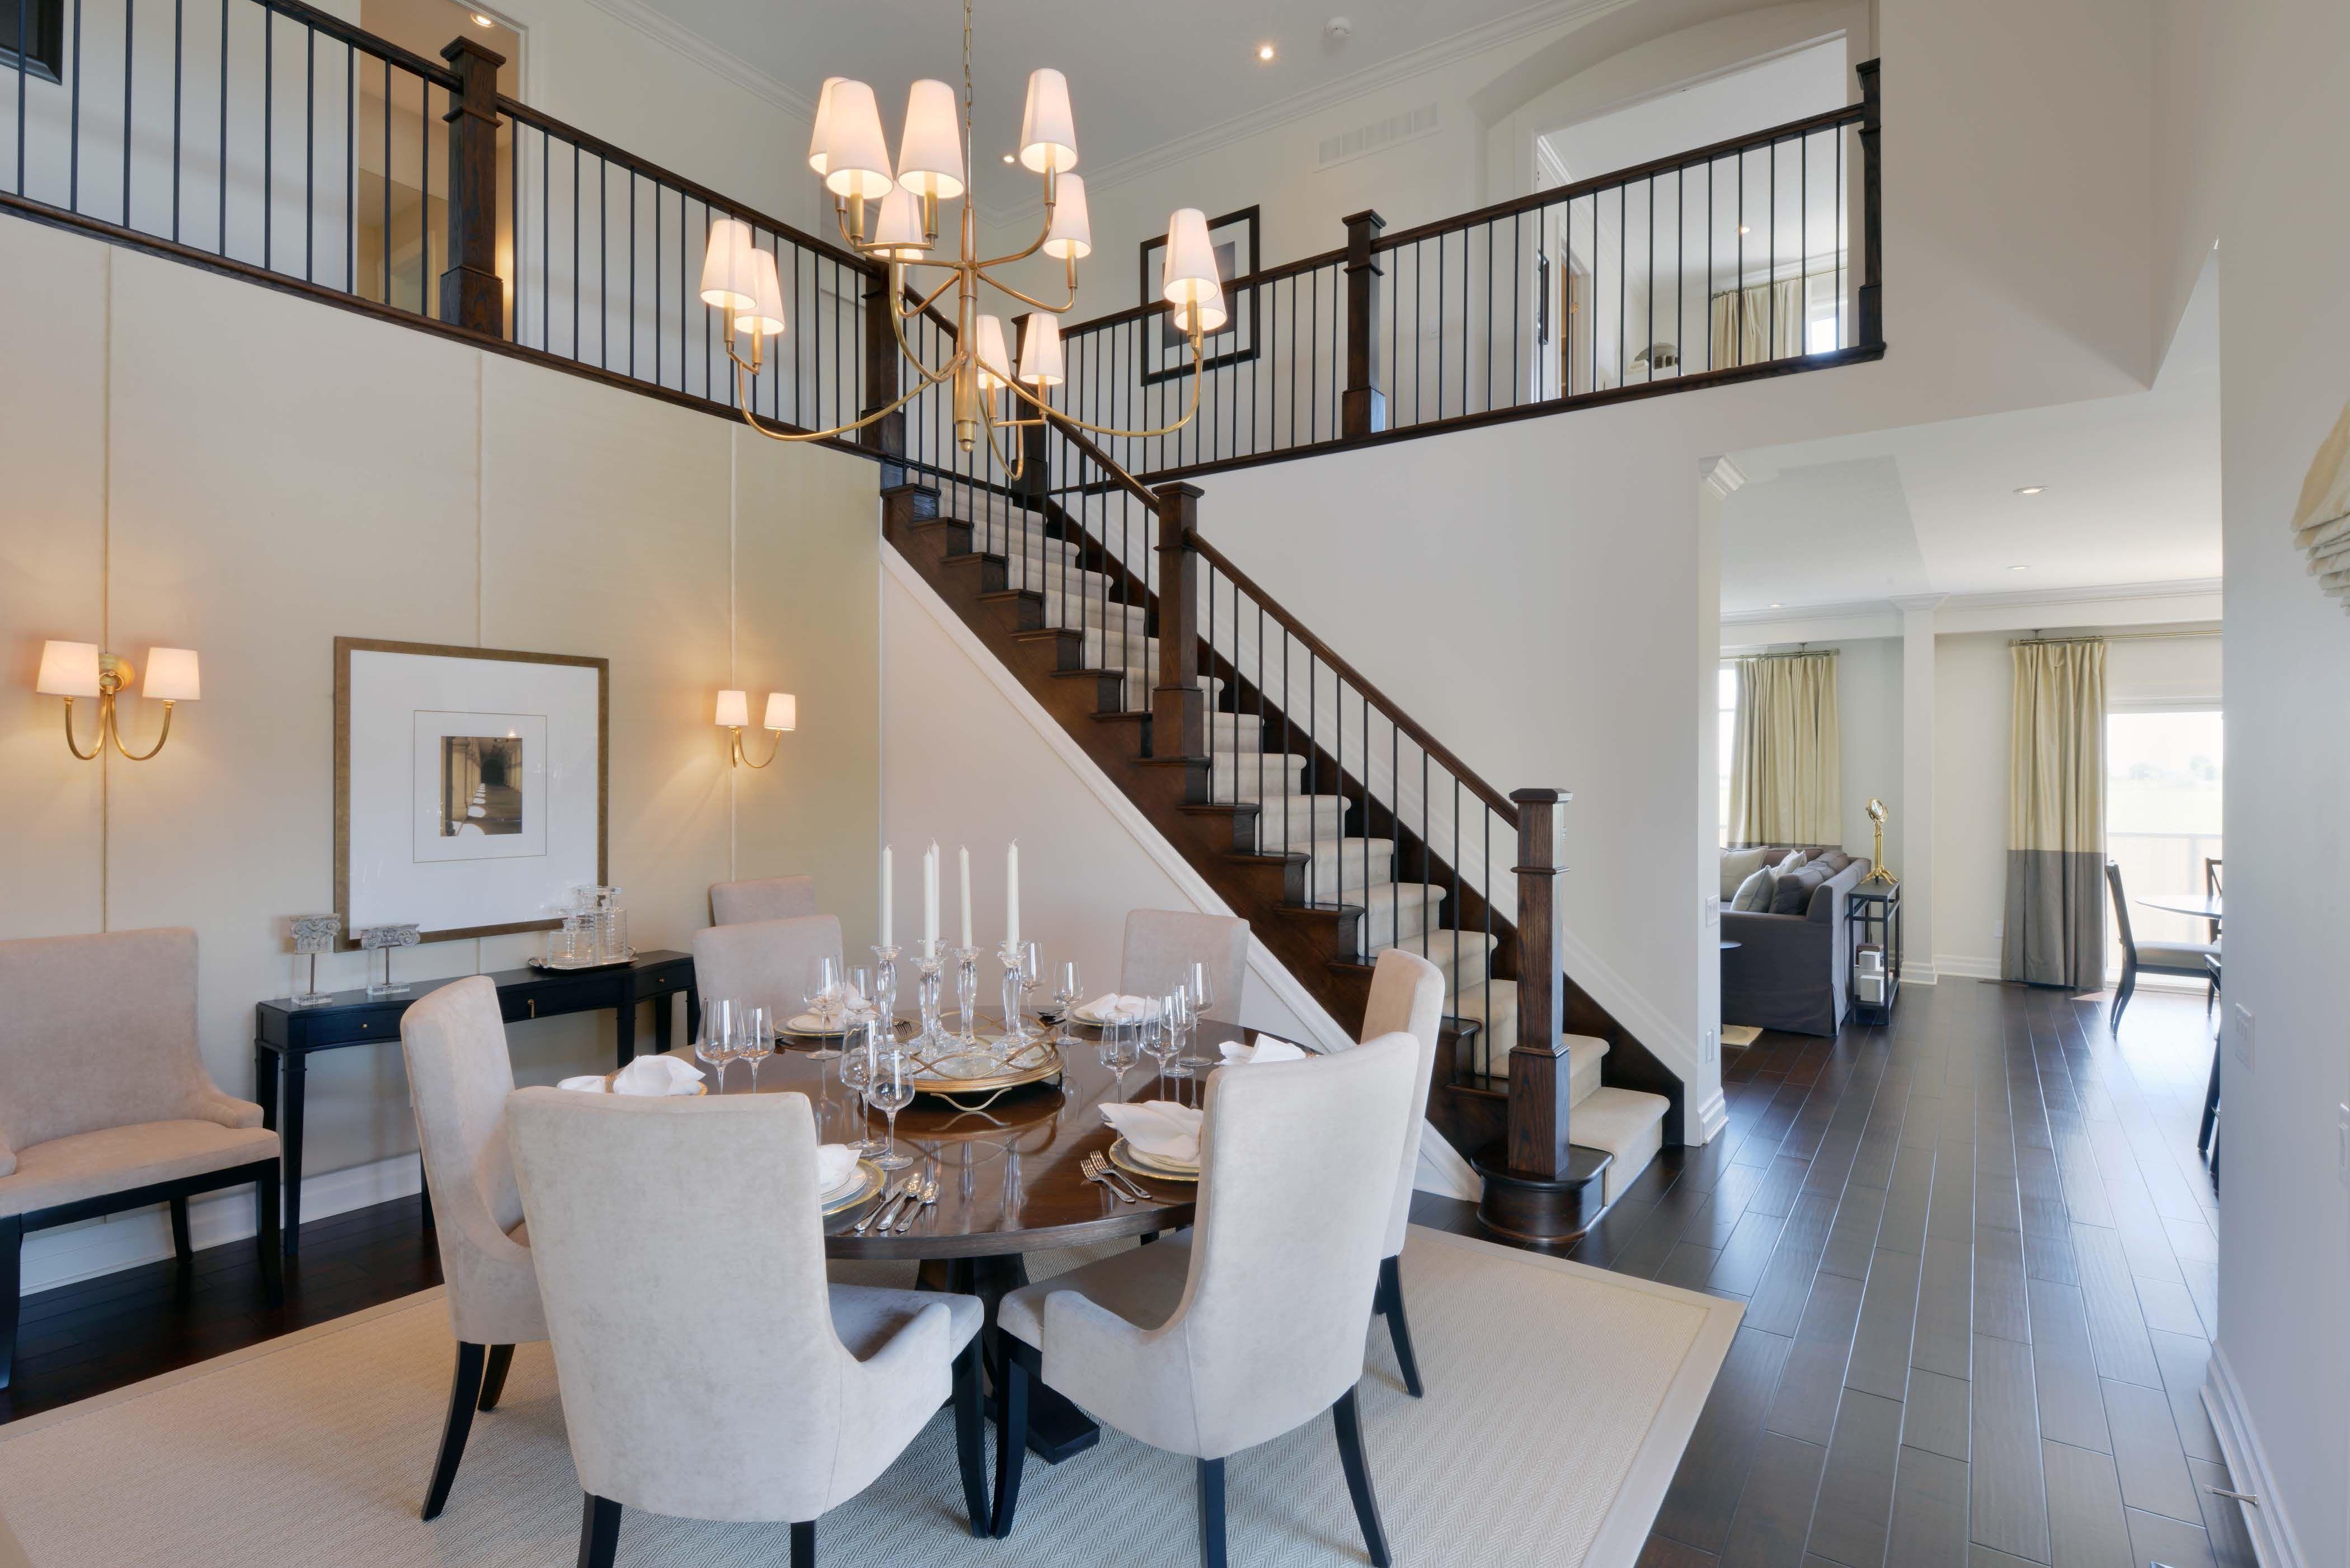 blackstone homes model dining area monarch ottawa kanata dining - Blackstone Home Design